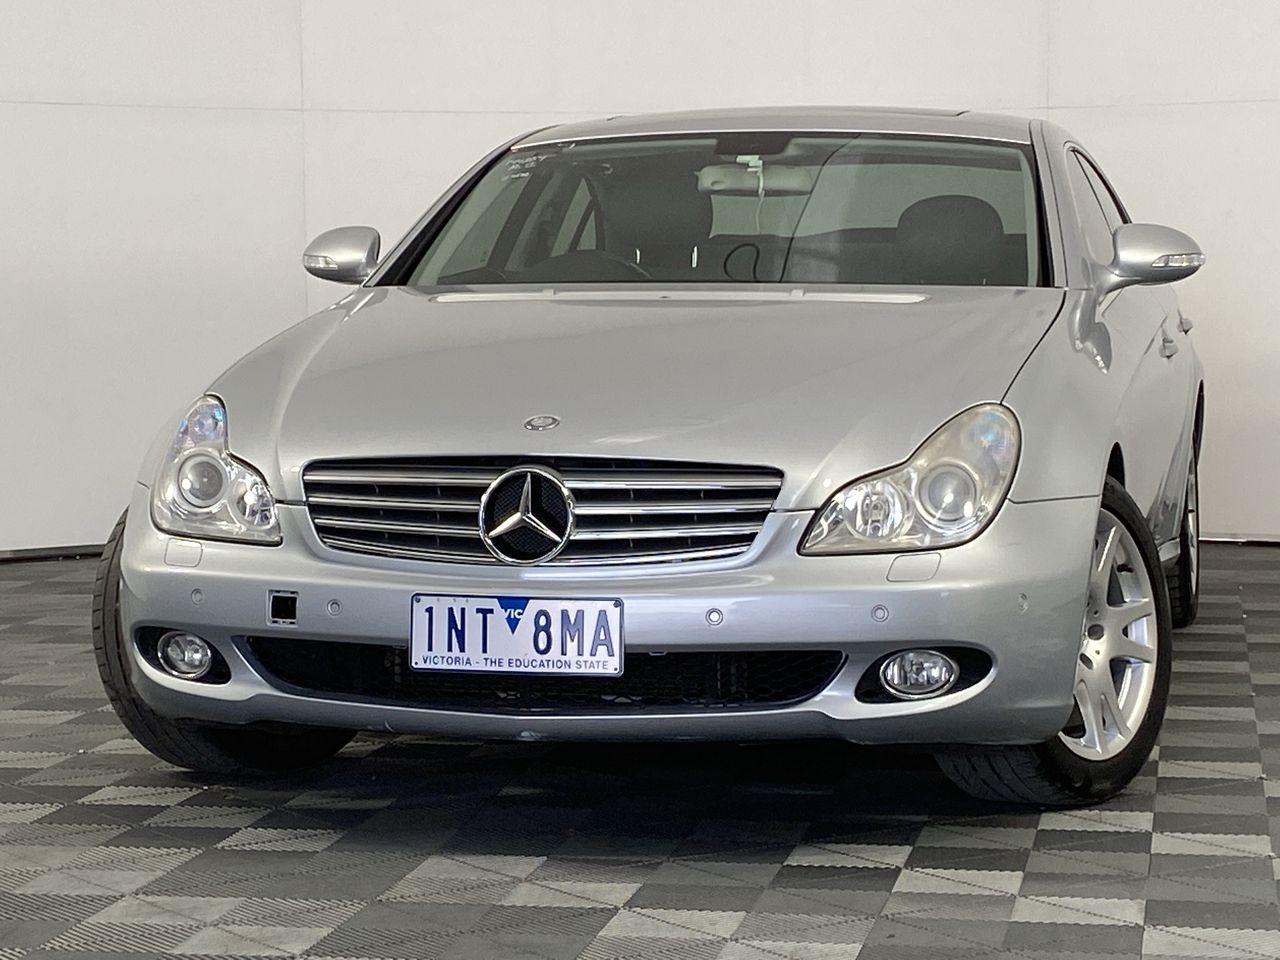 2006 Mercedes Benz CLS-Class CLS 350 C219 Automatic Coupe